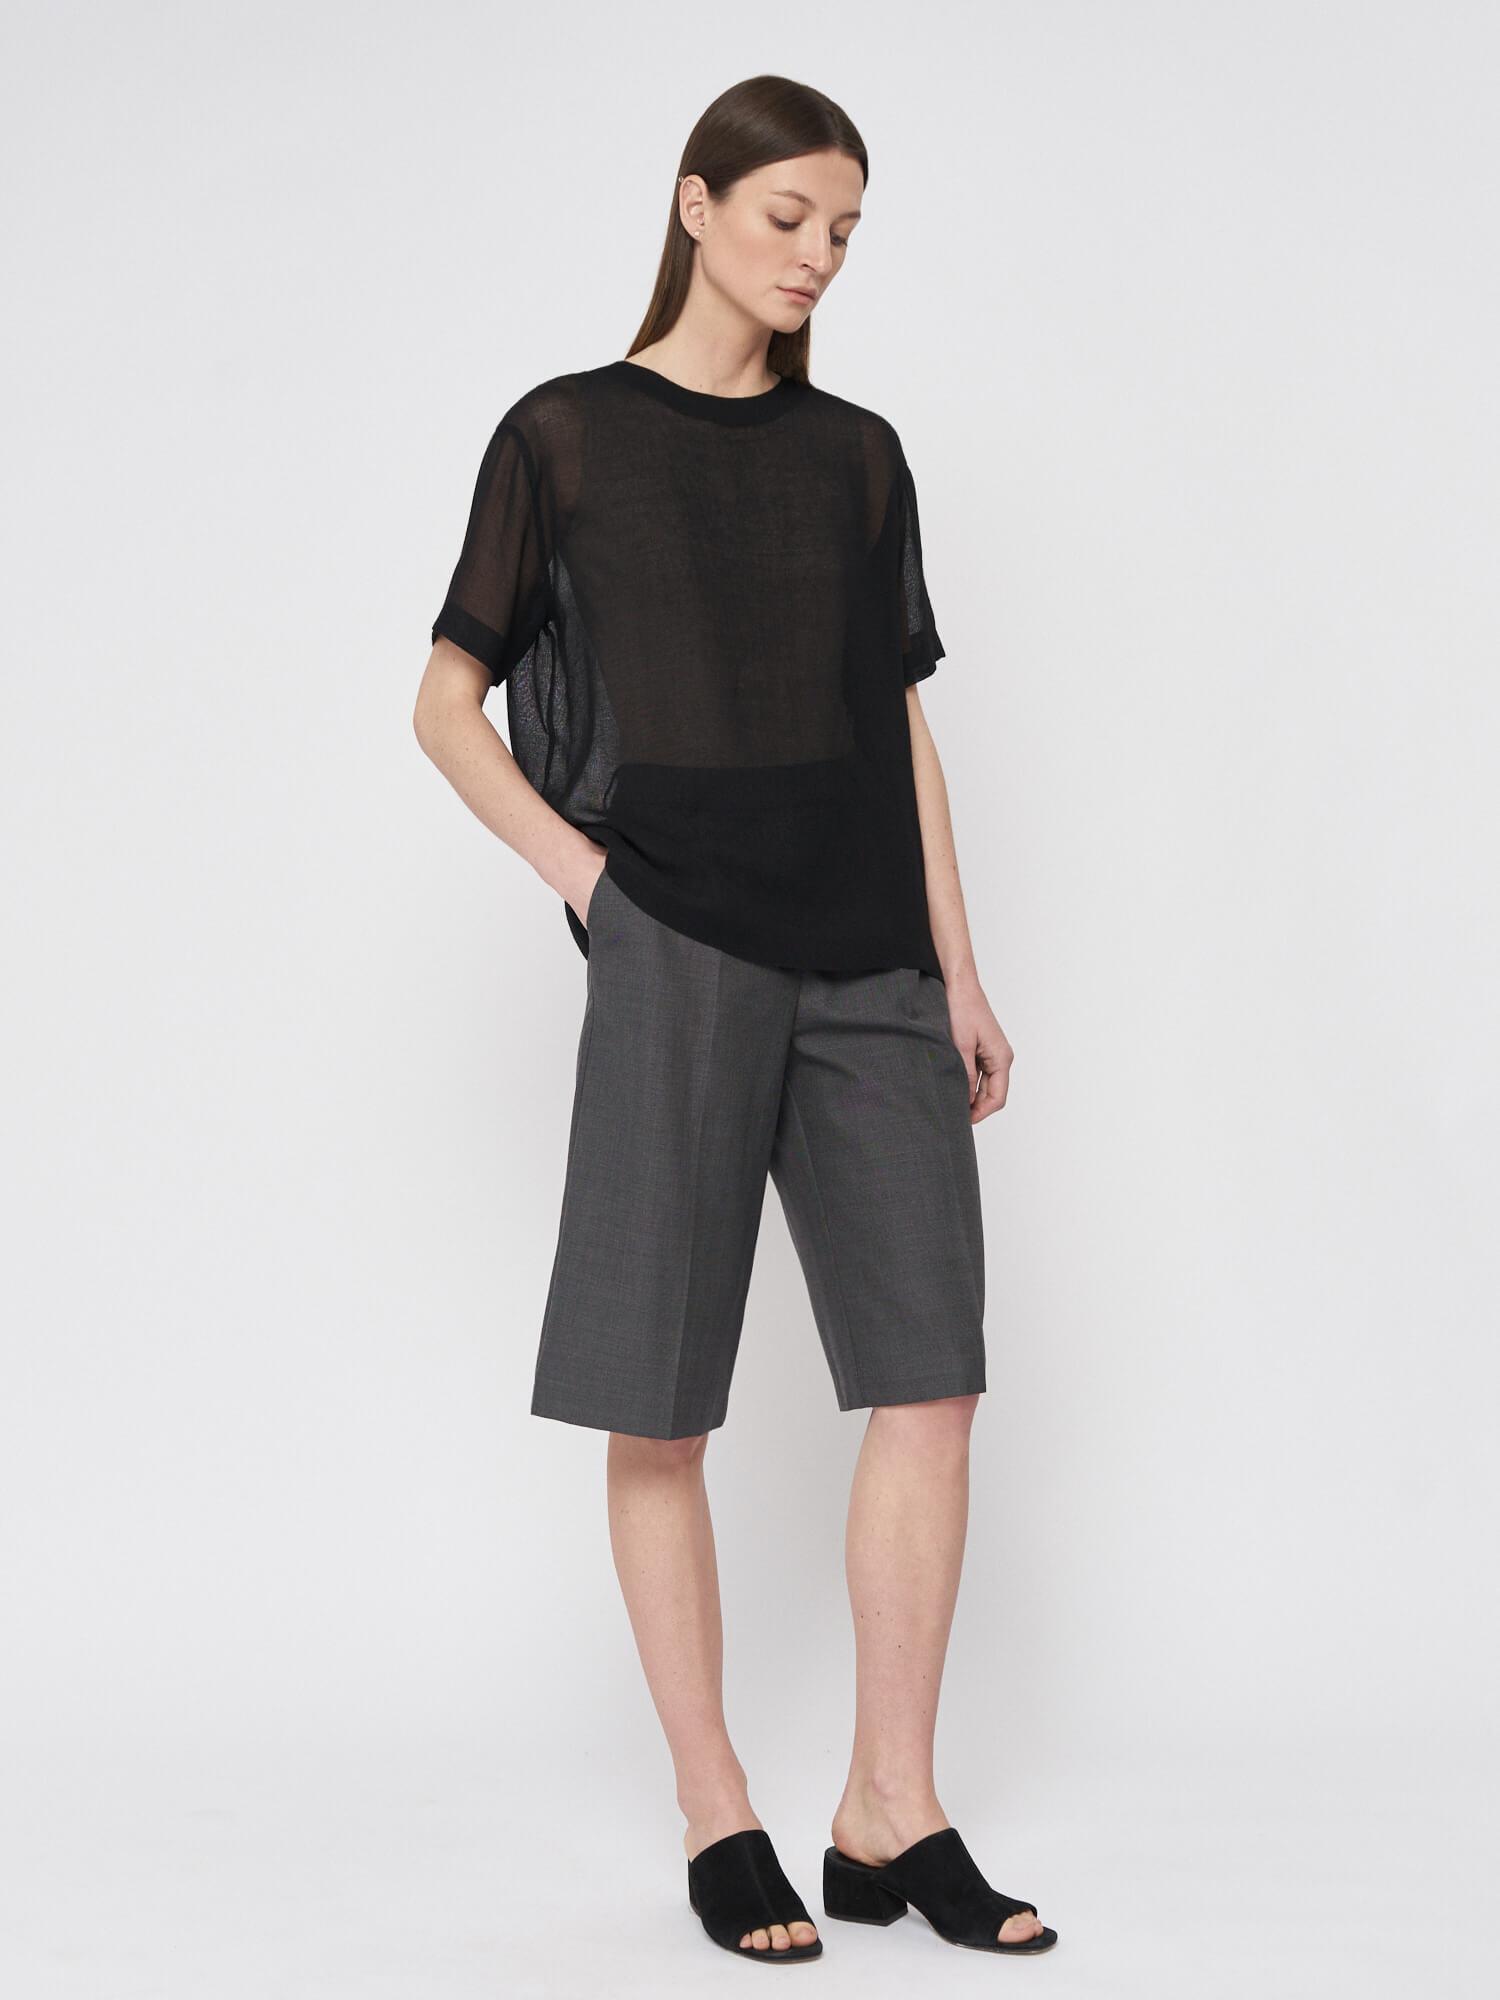 Блуза Rene прозрачная, Черный